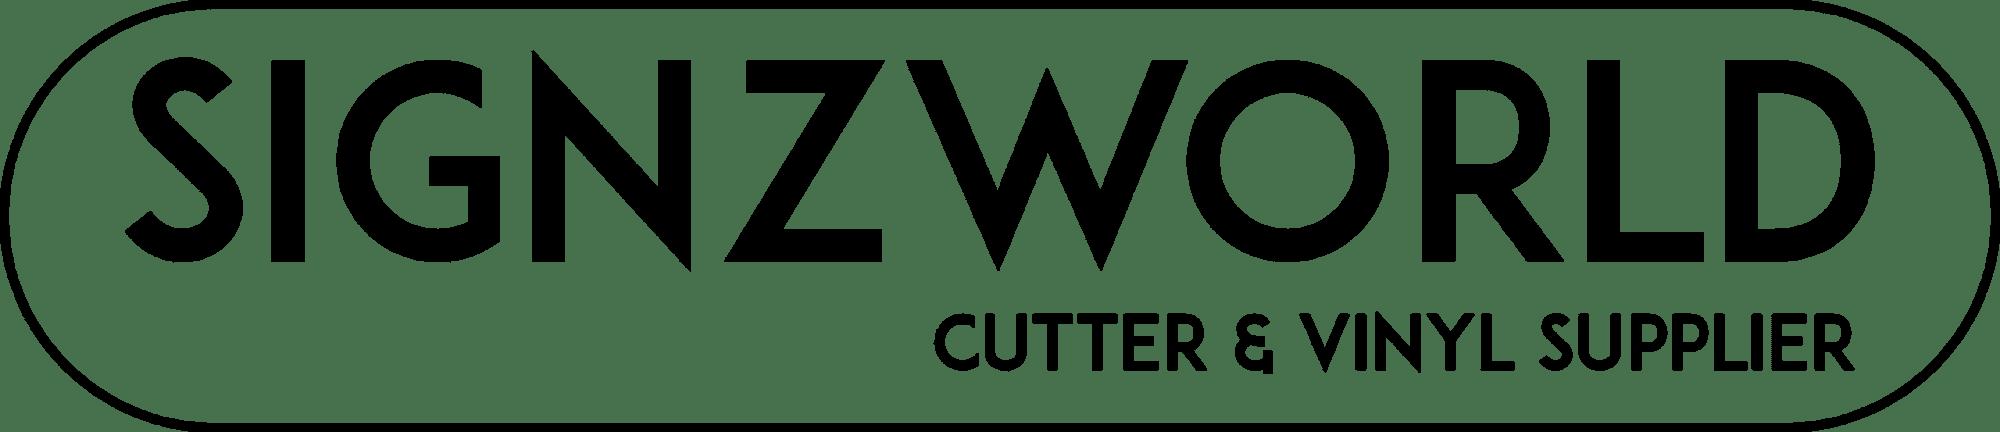 Signz World Cutter & Vinyl Supplier